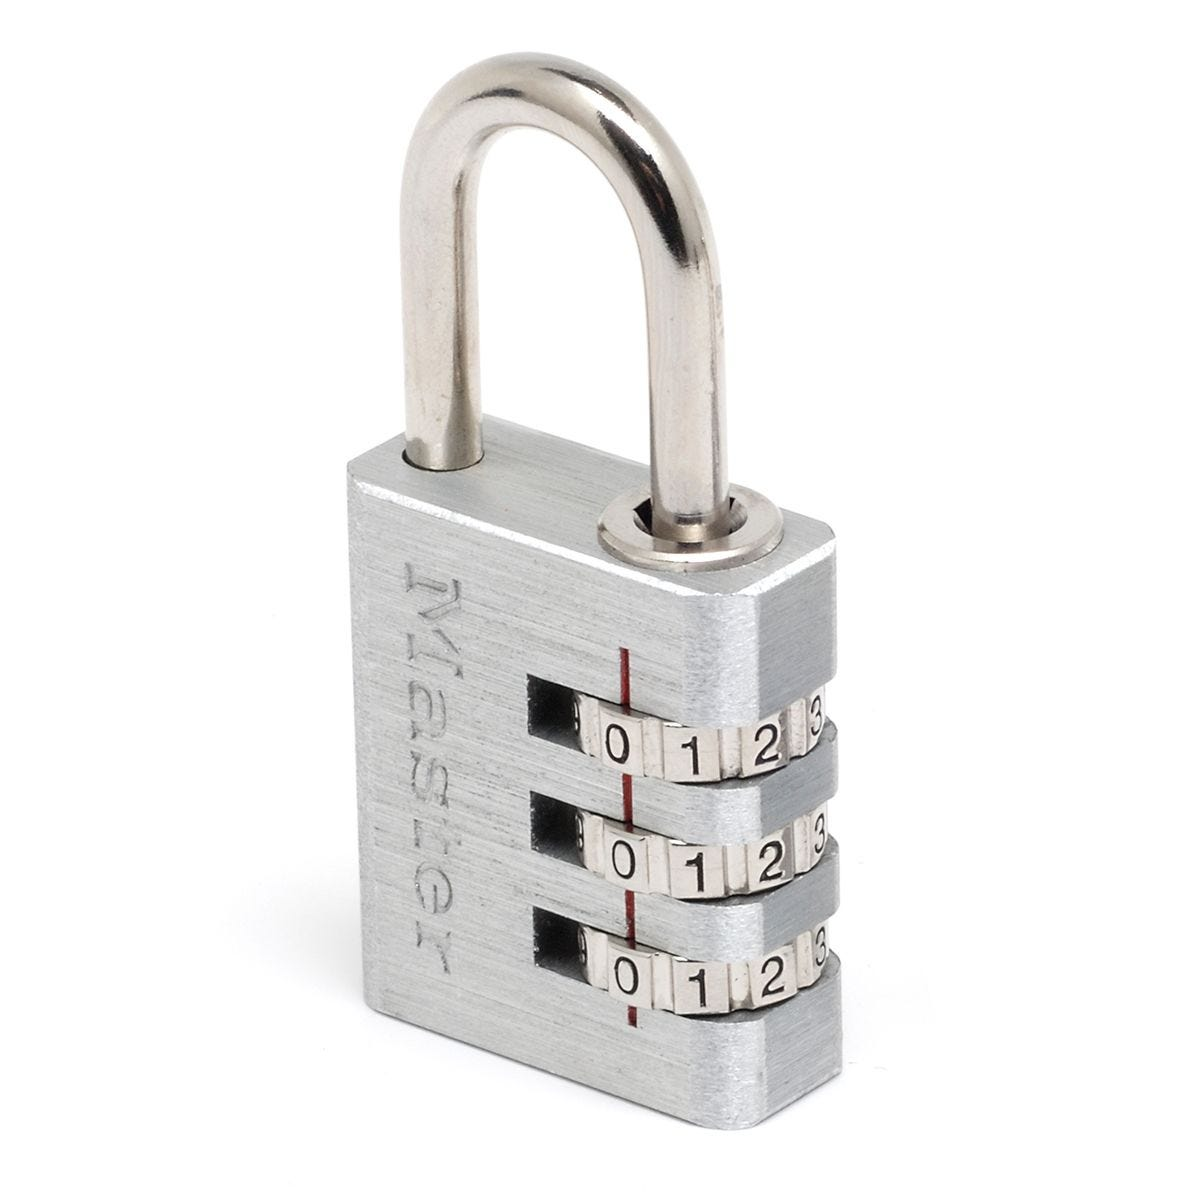 Master Lock 30mm Wide Set-Your-Own Combination Aluminum Body Padlock